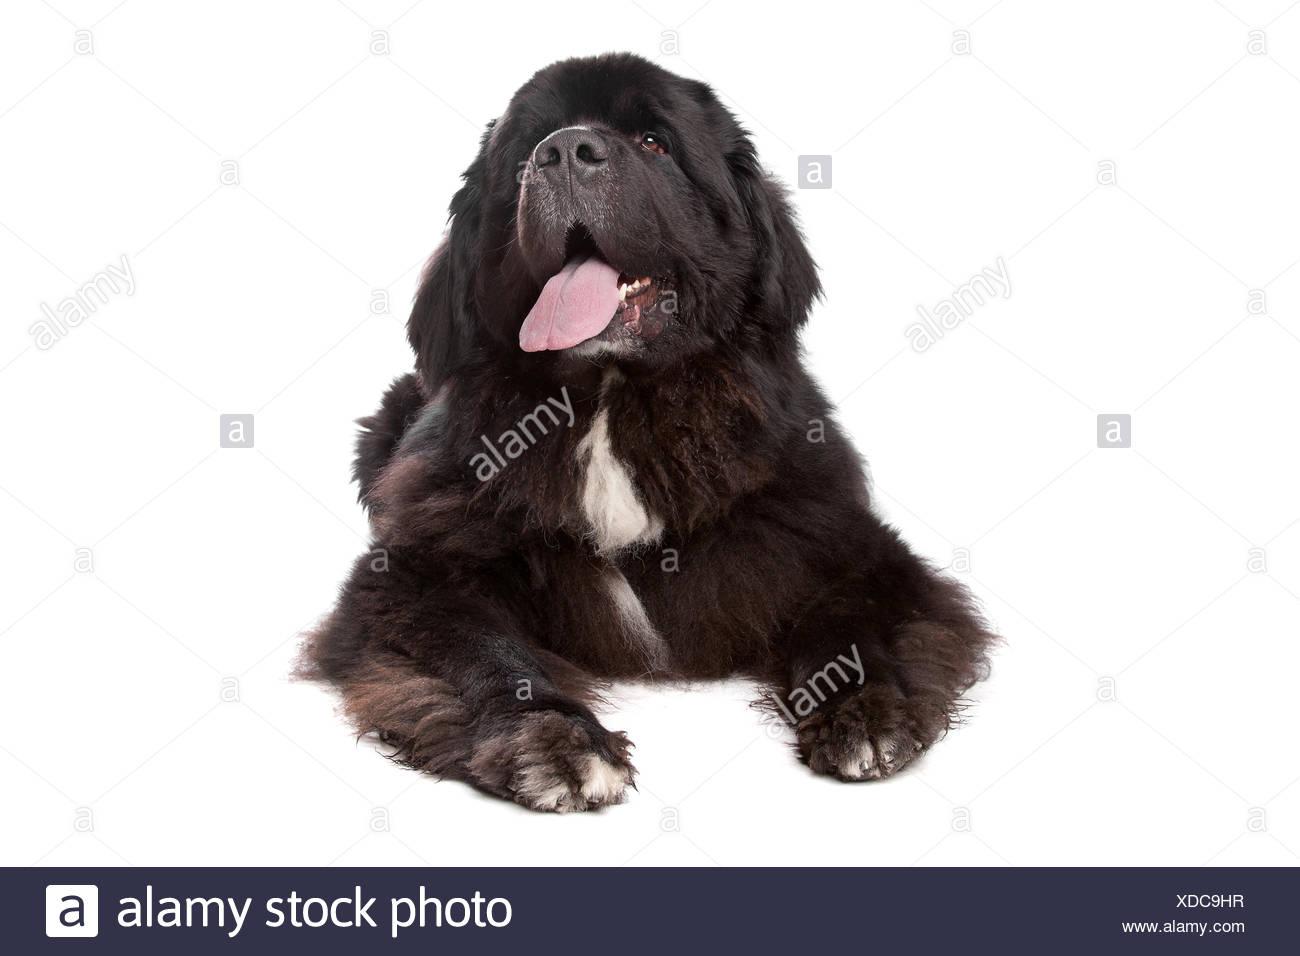 pets, isolated, animal, pet, mammal, bear, giant, over, dog, studio, one, cut, - Stock Image